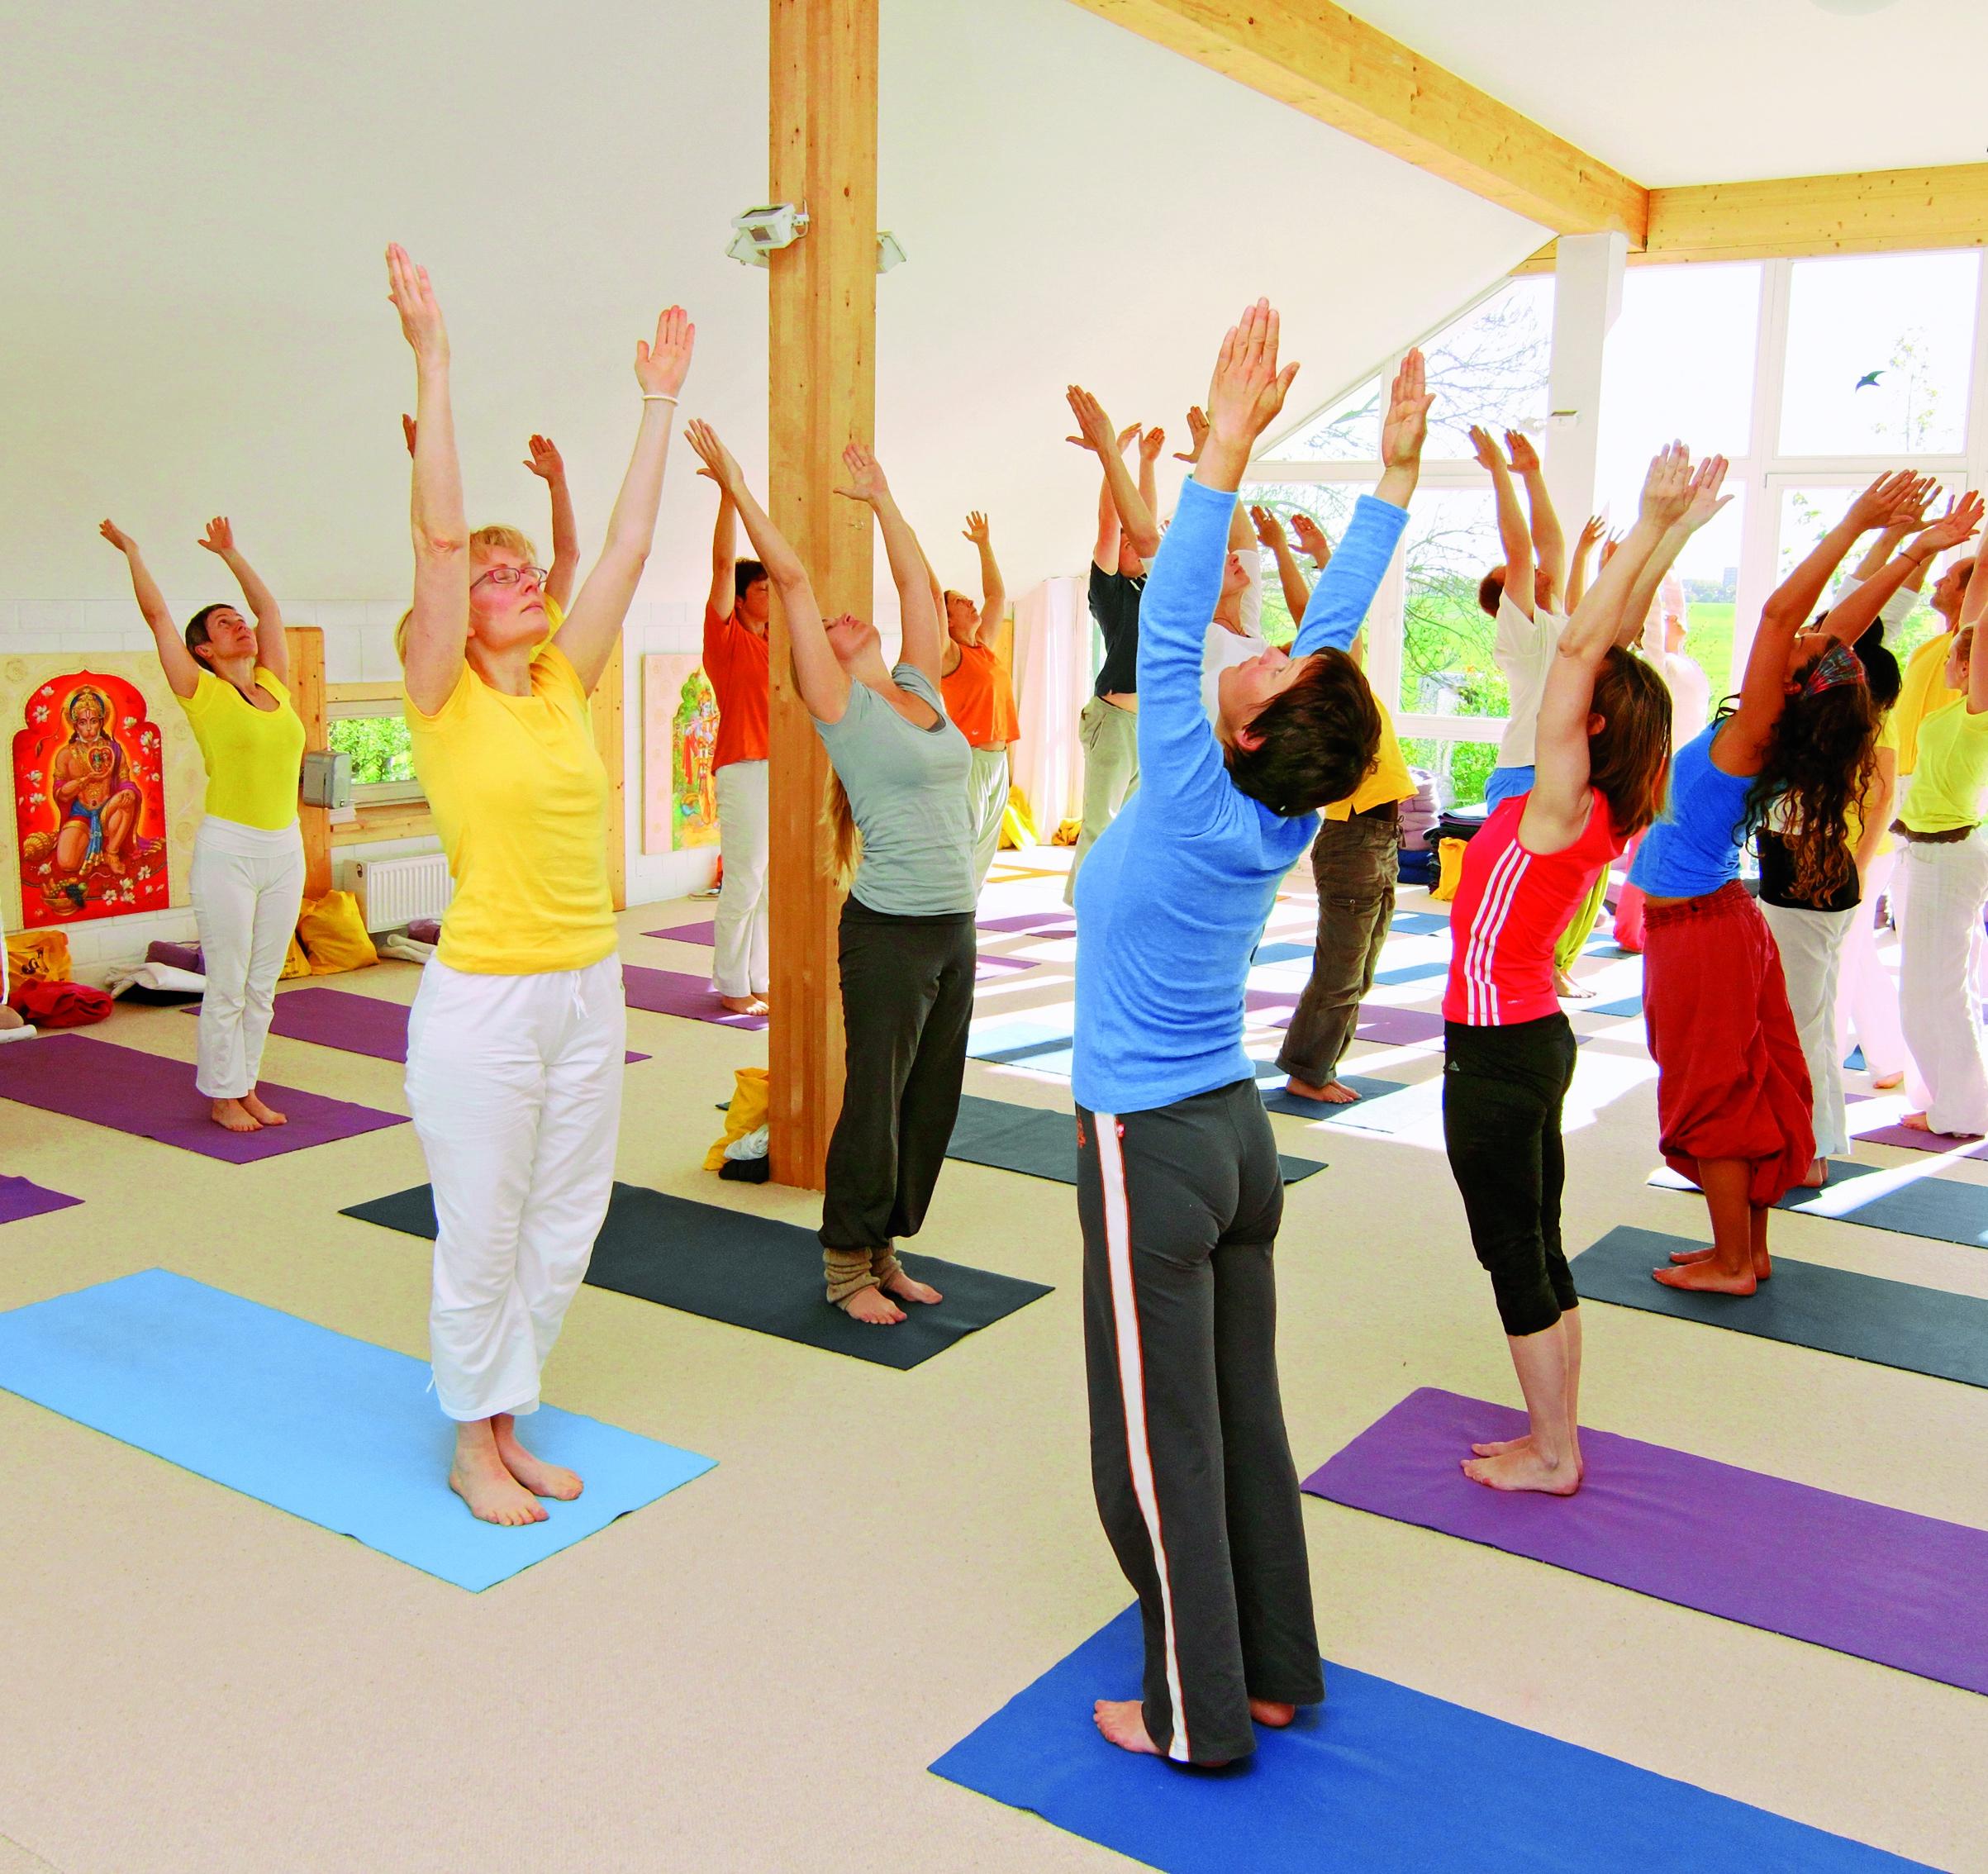 Events Archive - Seite 64 von 157 - Yoga Vidya Blog - Yoga ...